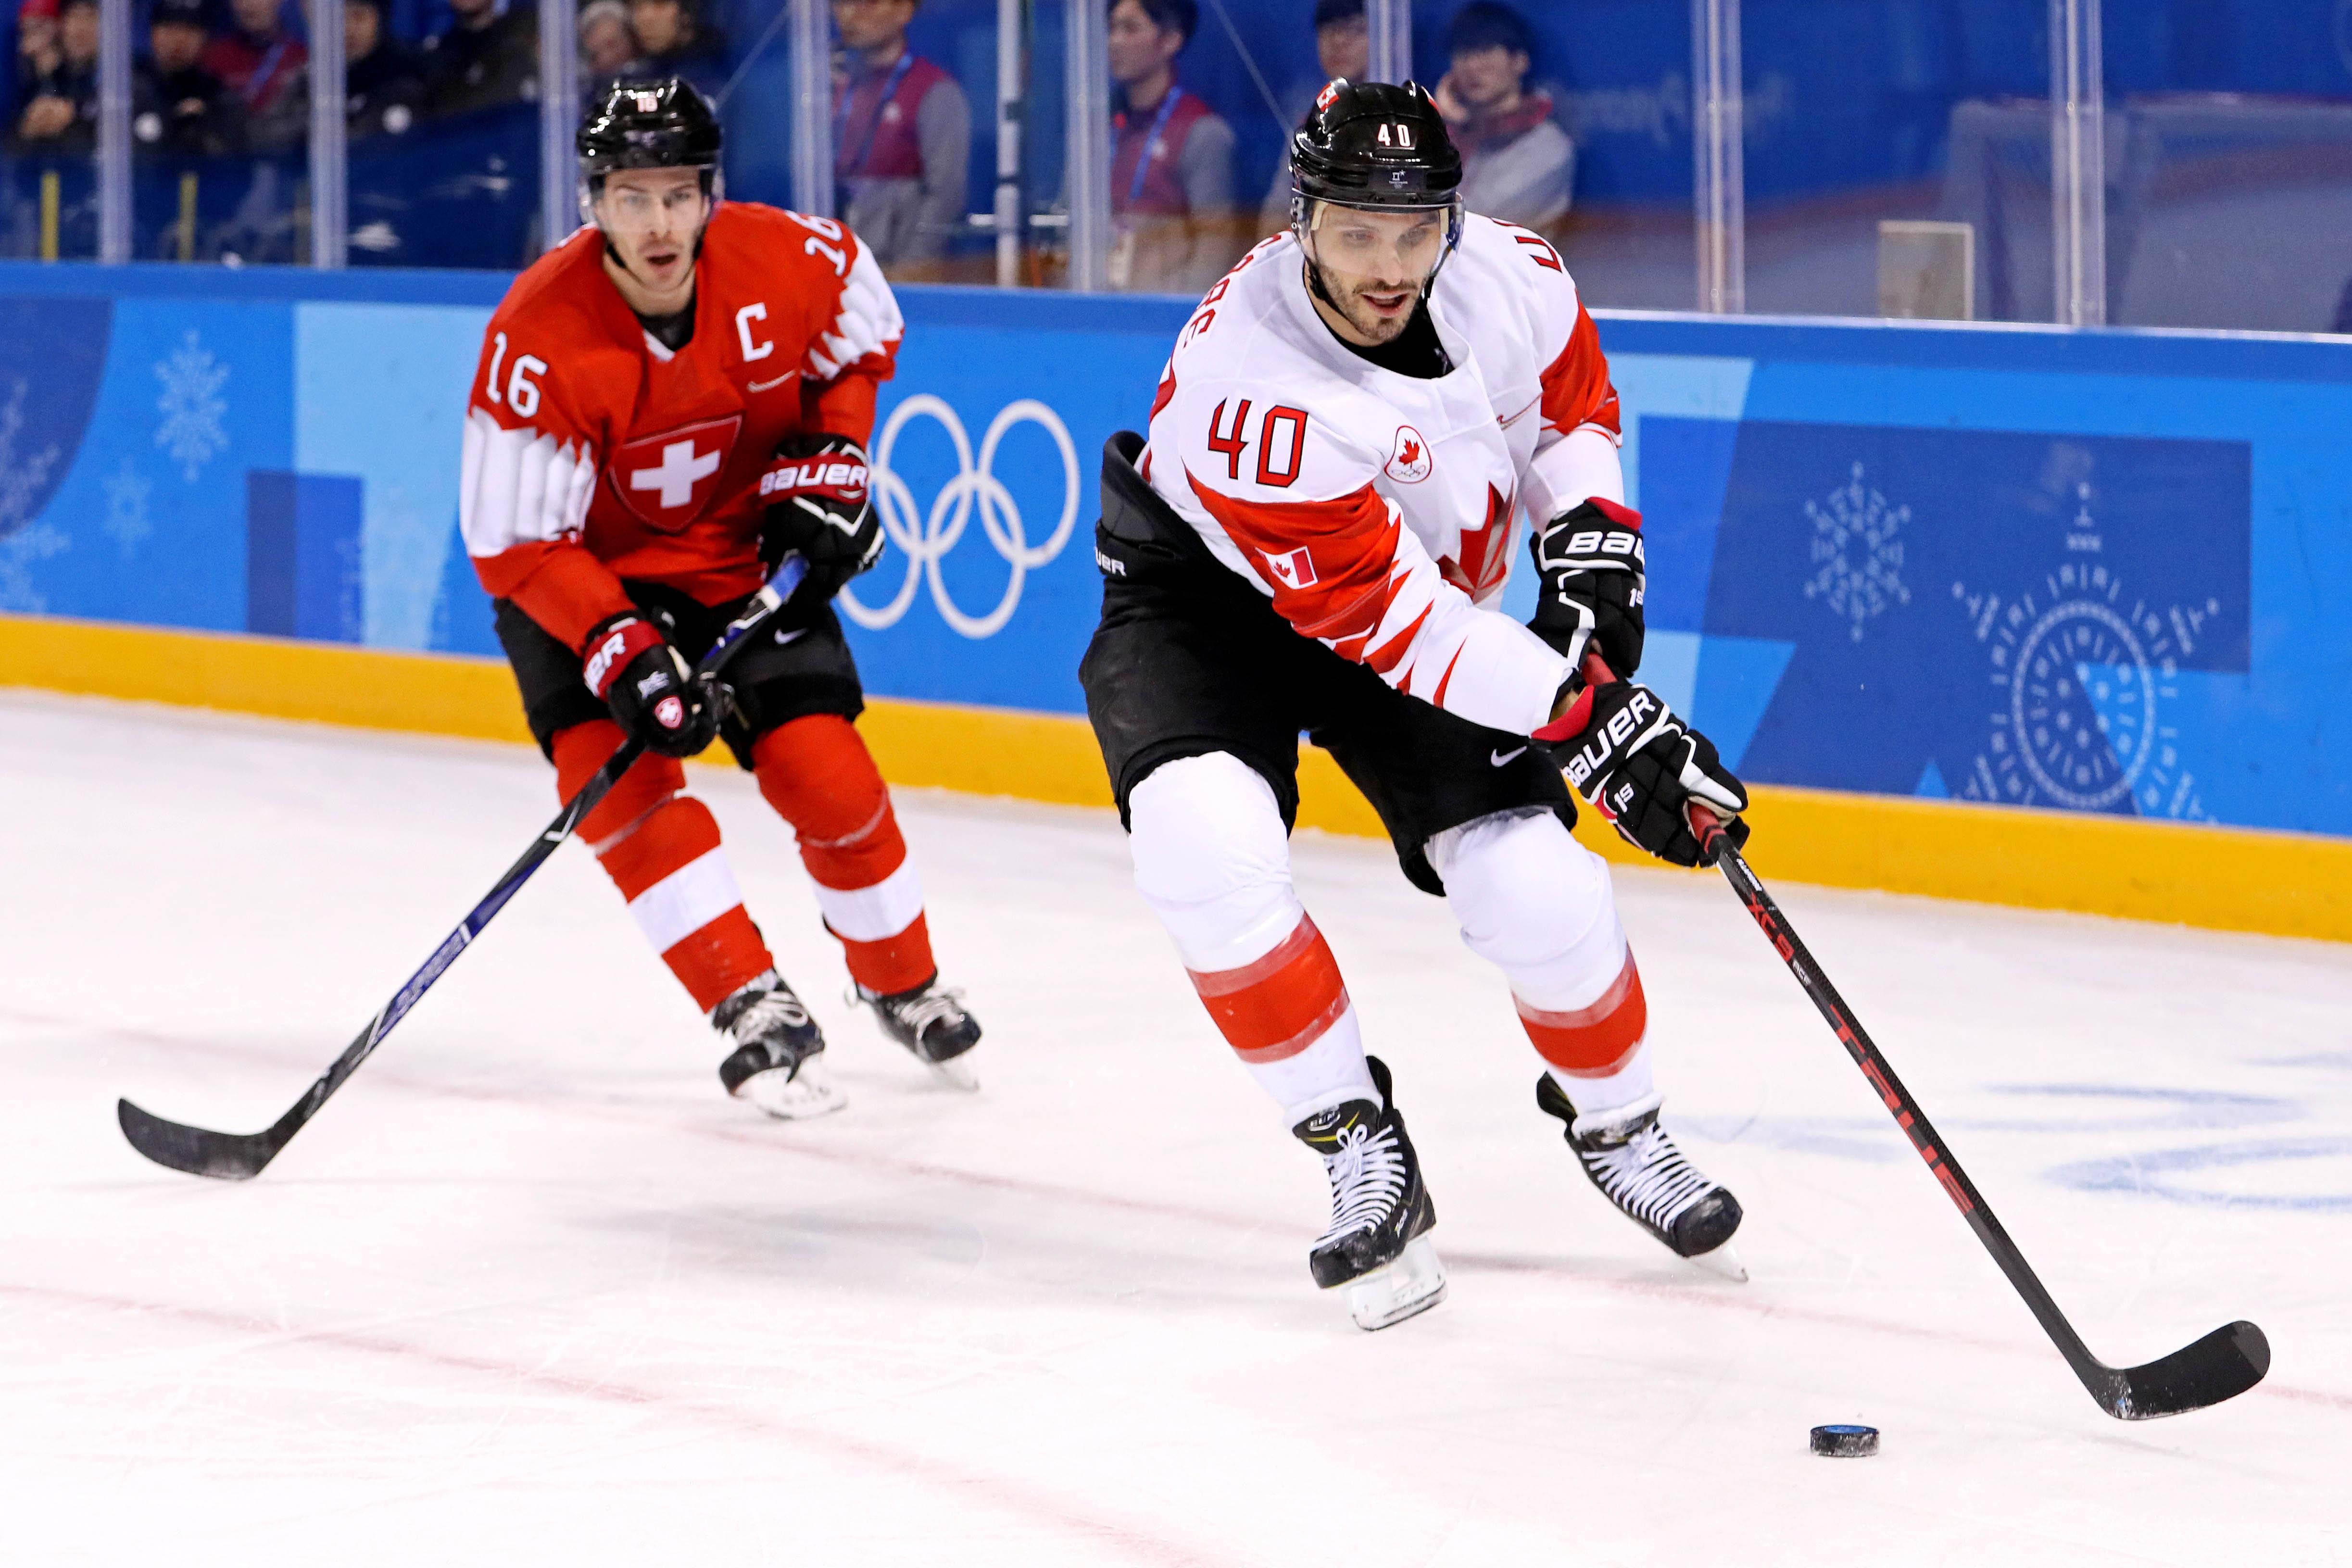 Olympics: Ice Hockey-Men Team Group A - SUI-CAN